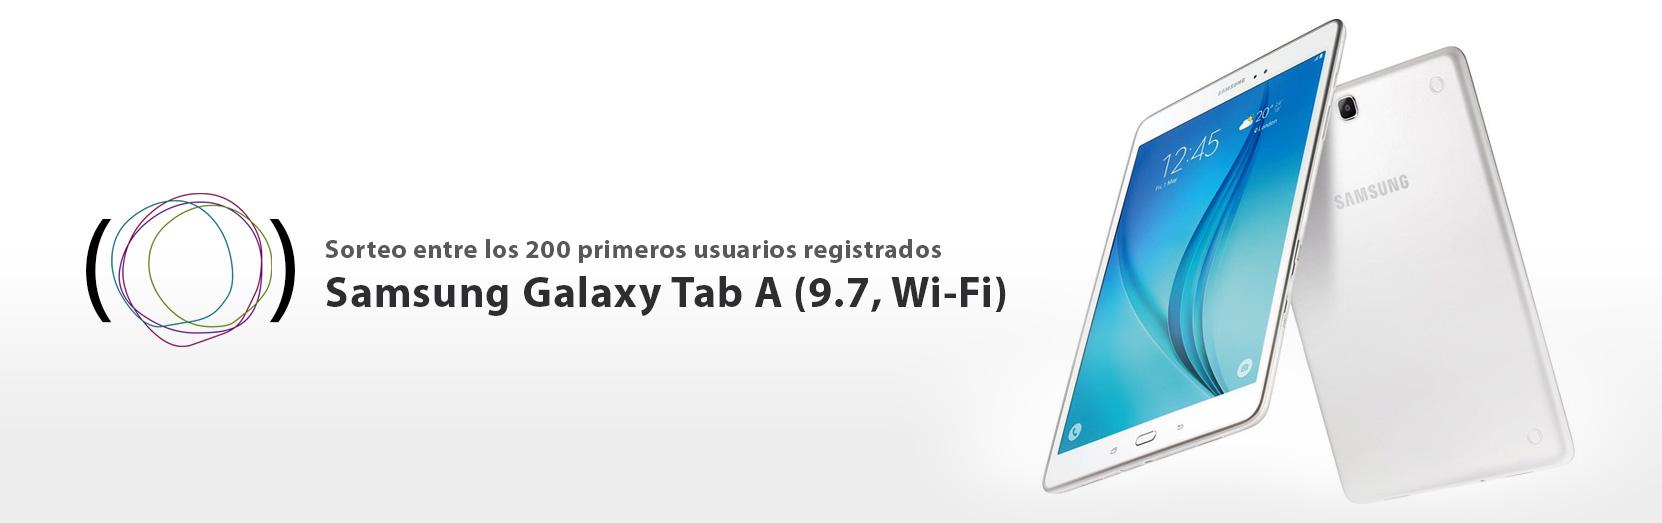 Regístrate y gana una tablet Samsung Galaxy Tab A